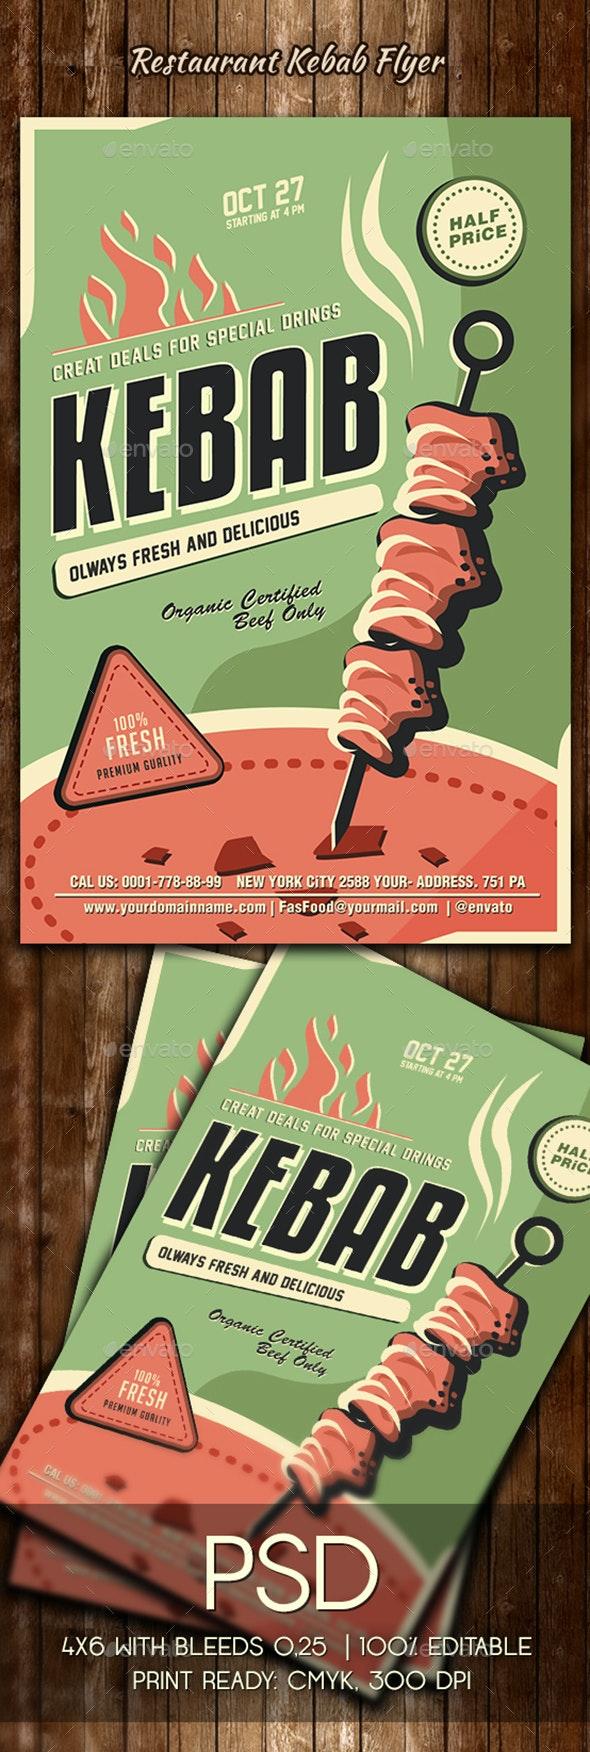 Kebab Flyer Template - Restaurant Flyers